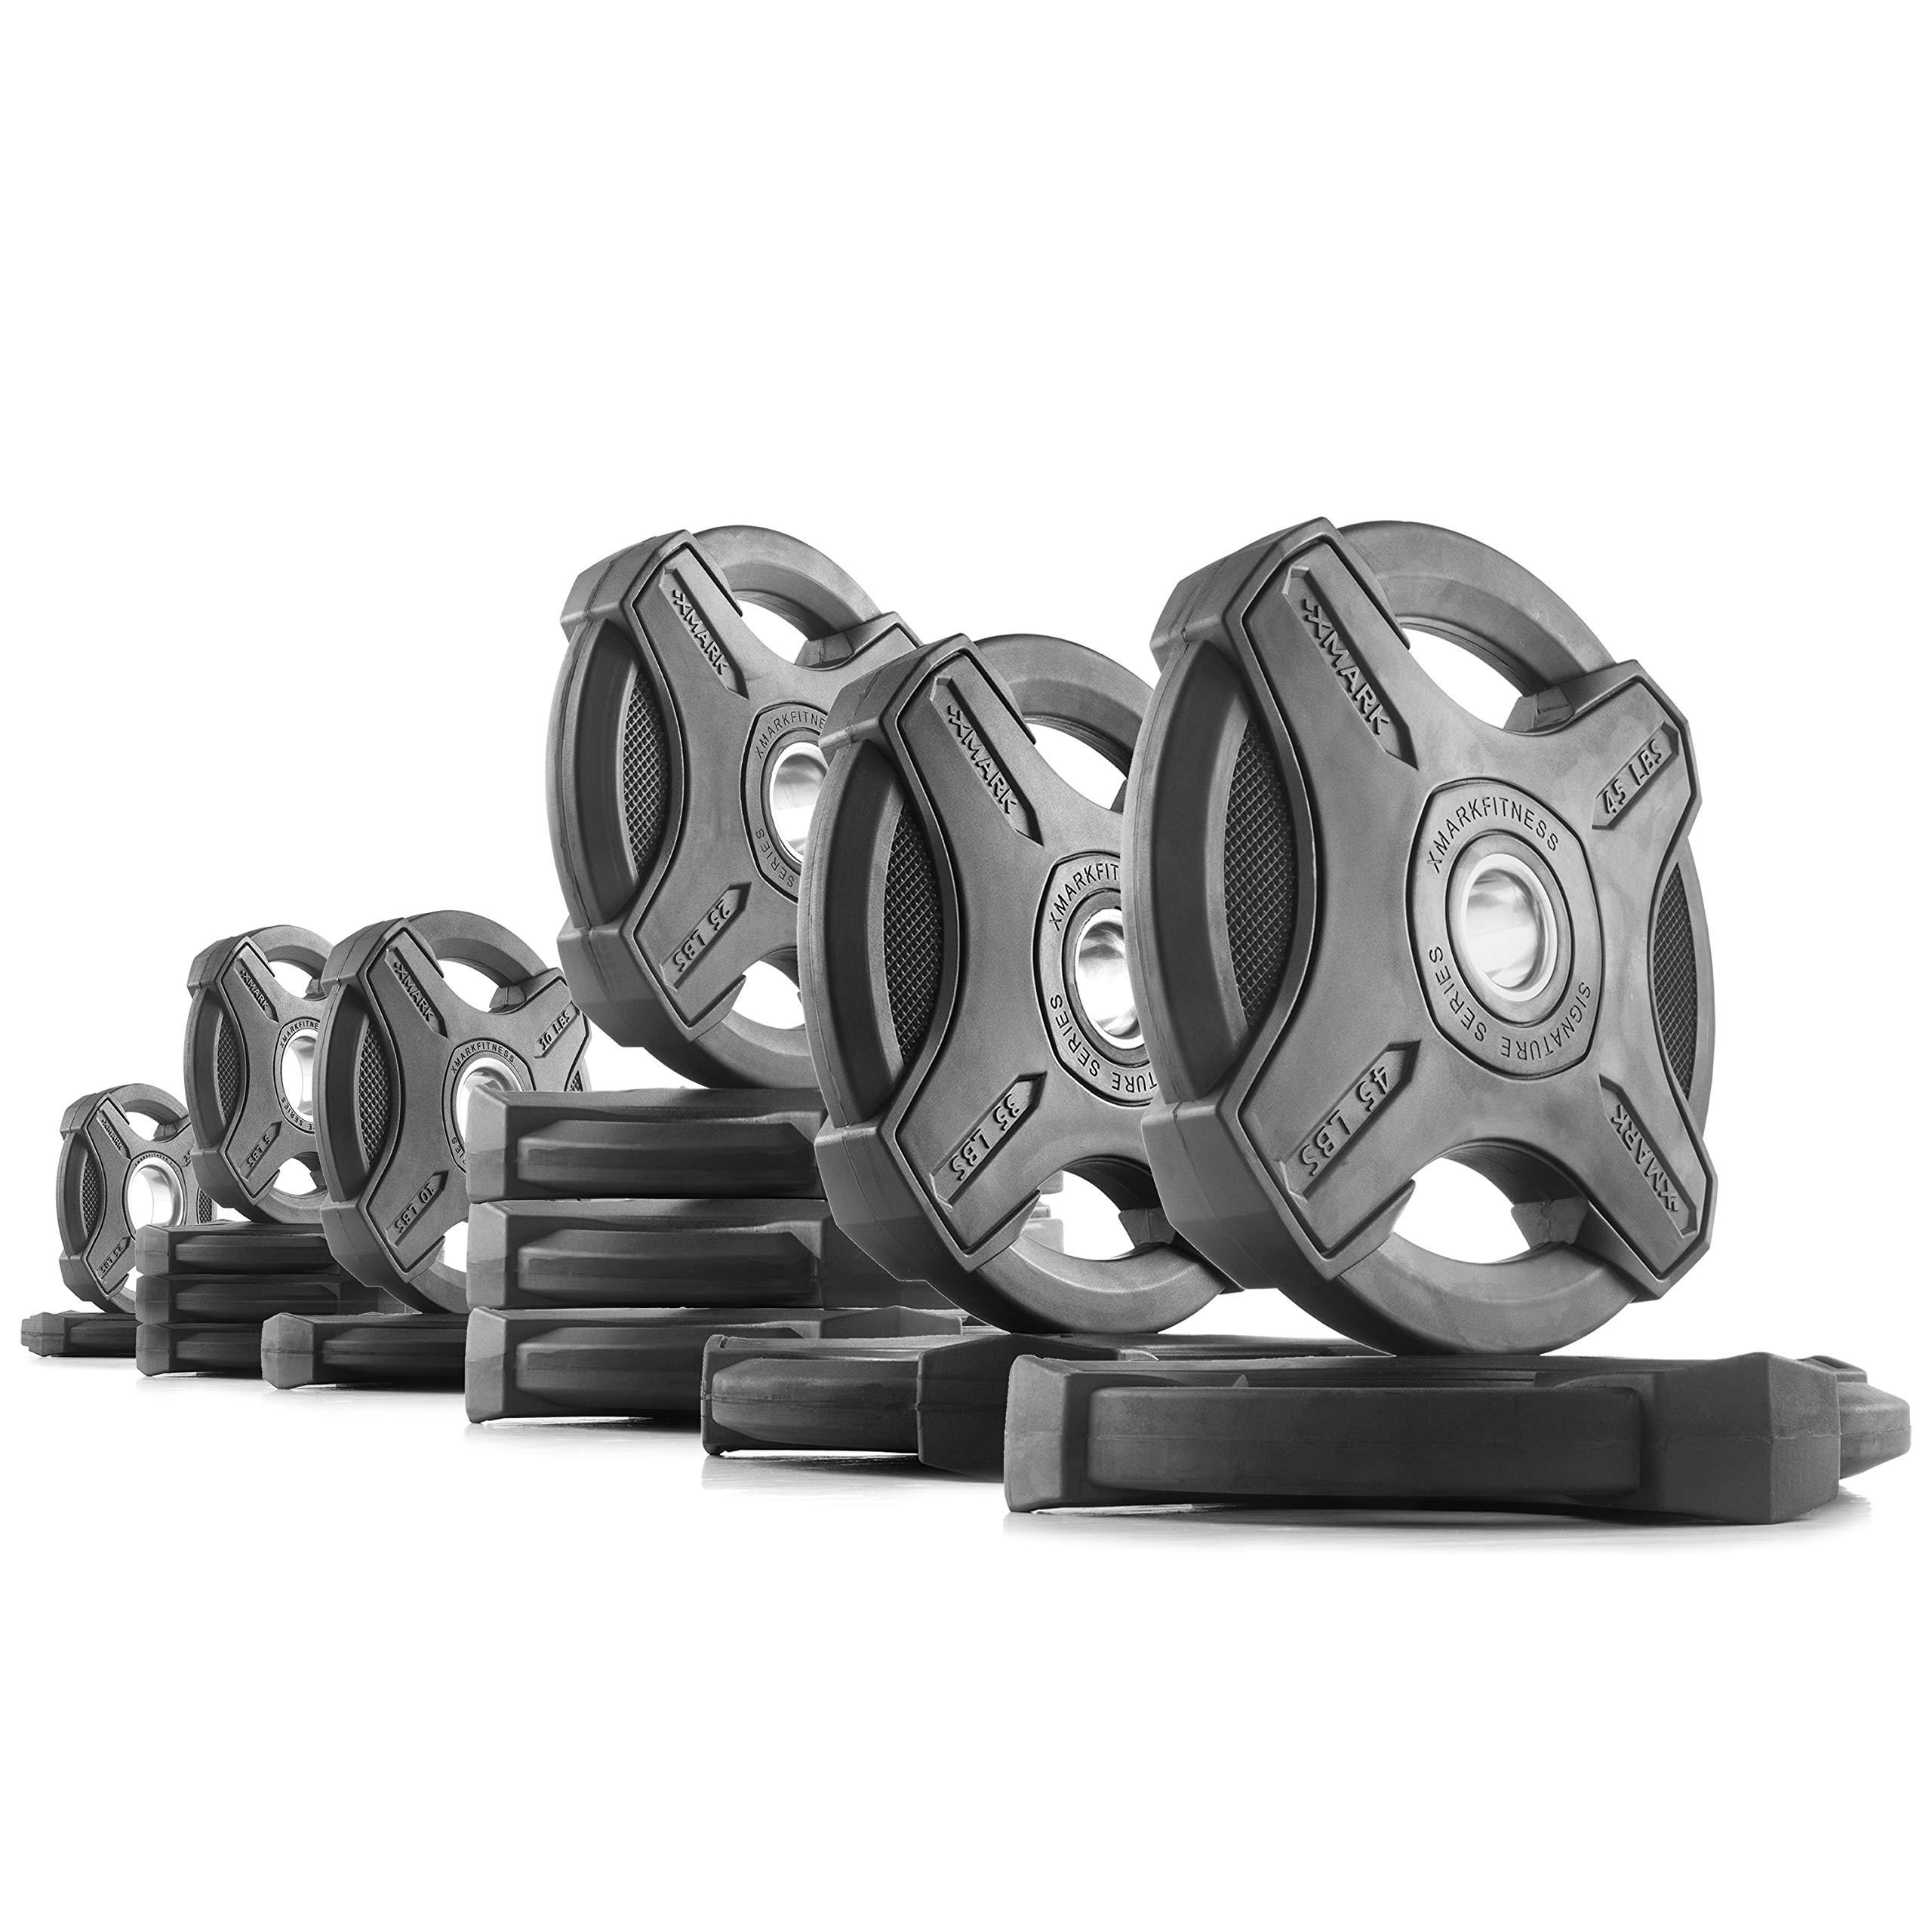 XMark 305 lb Set Signature Plates, One-Year Warranty, Olympic Weight Plates, Cutting-Edge Design